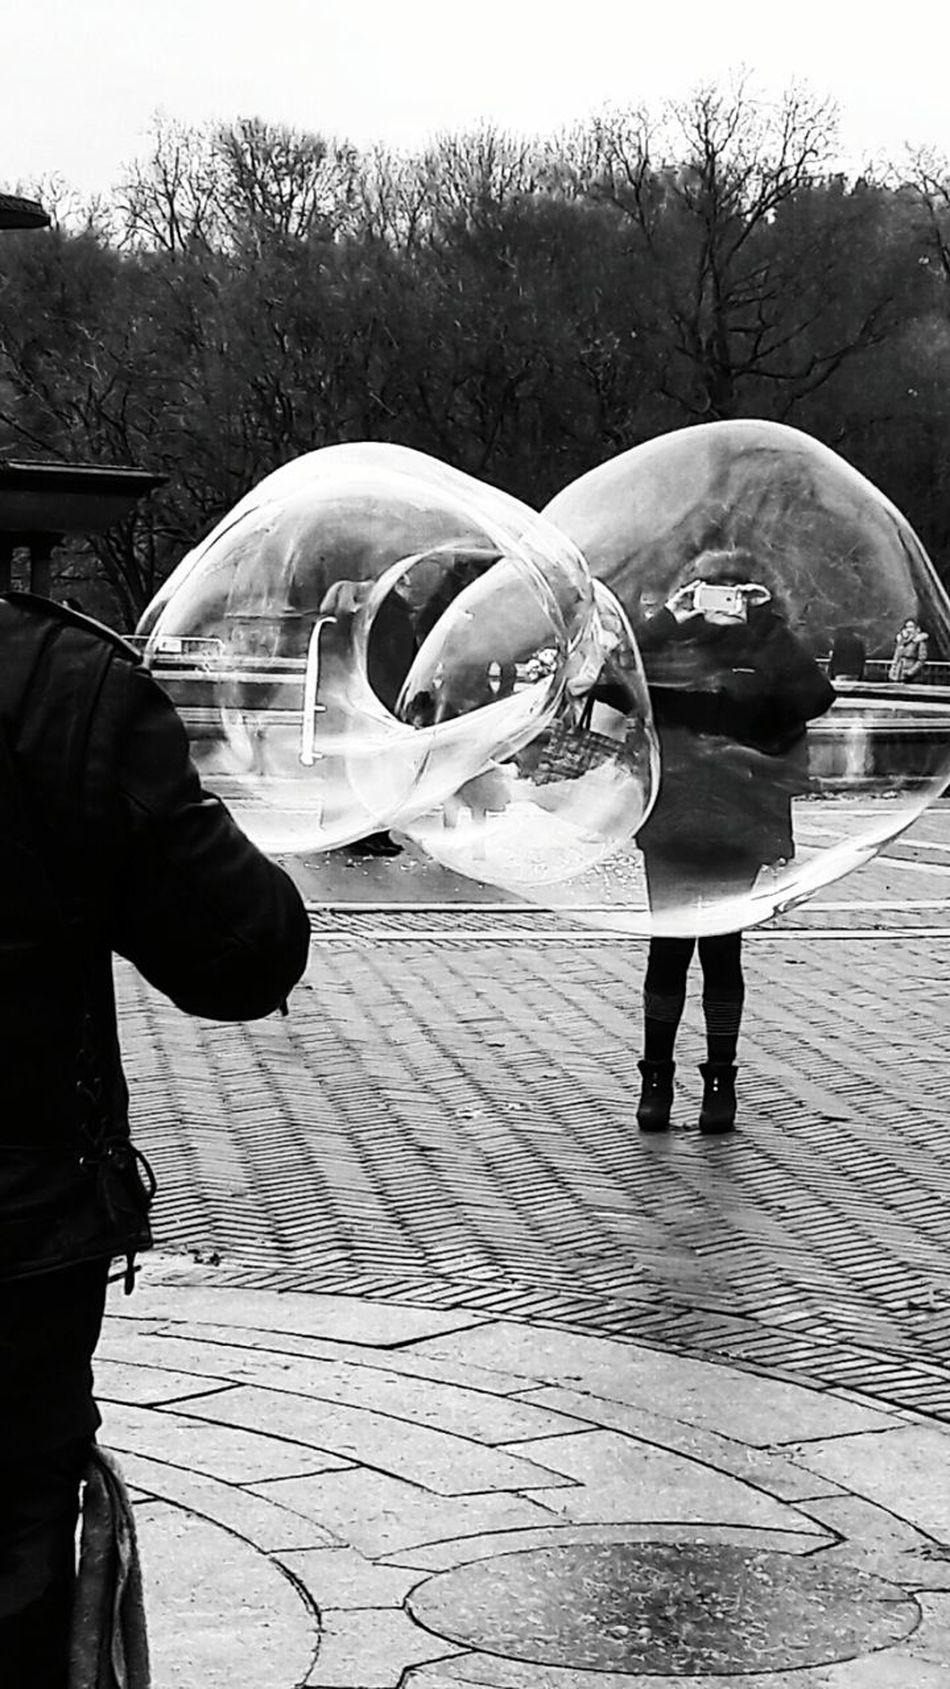 Outdoors People Hello World ✌ Popular Photos Week Of Eyeem Bubbles! Pompas De Jabón Front View Looking At Camera Beautiful Woman Popular